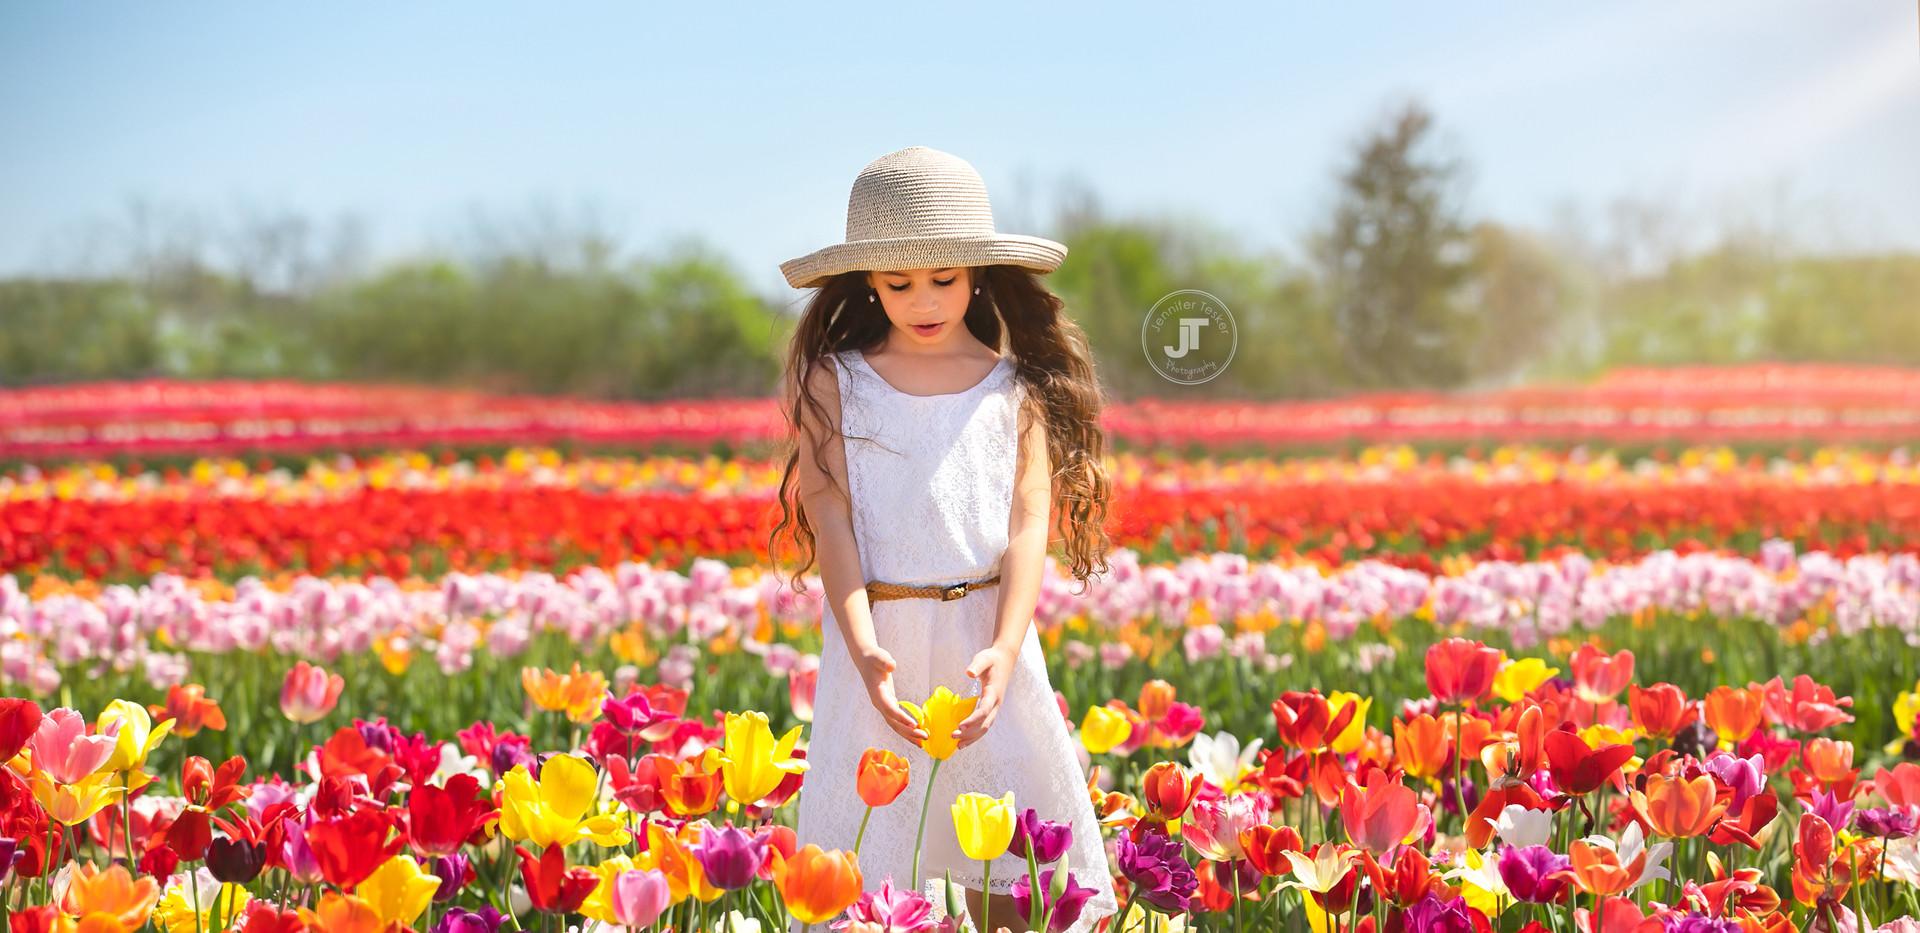 Tulip 2019 (1 of 2) copy.jpg